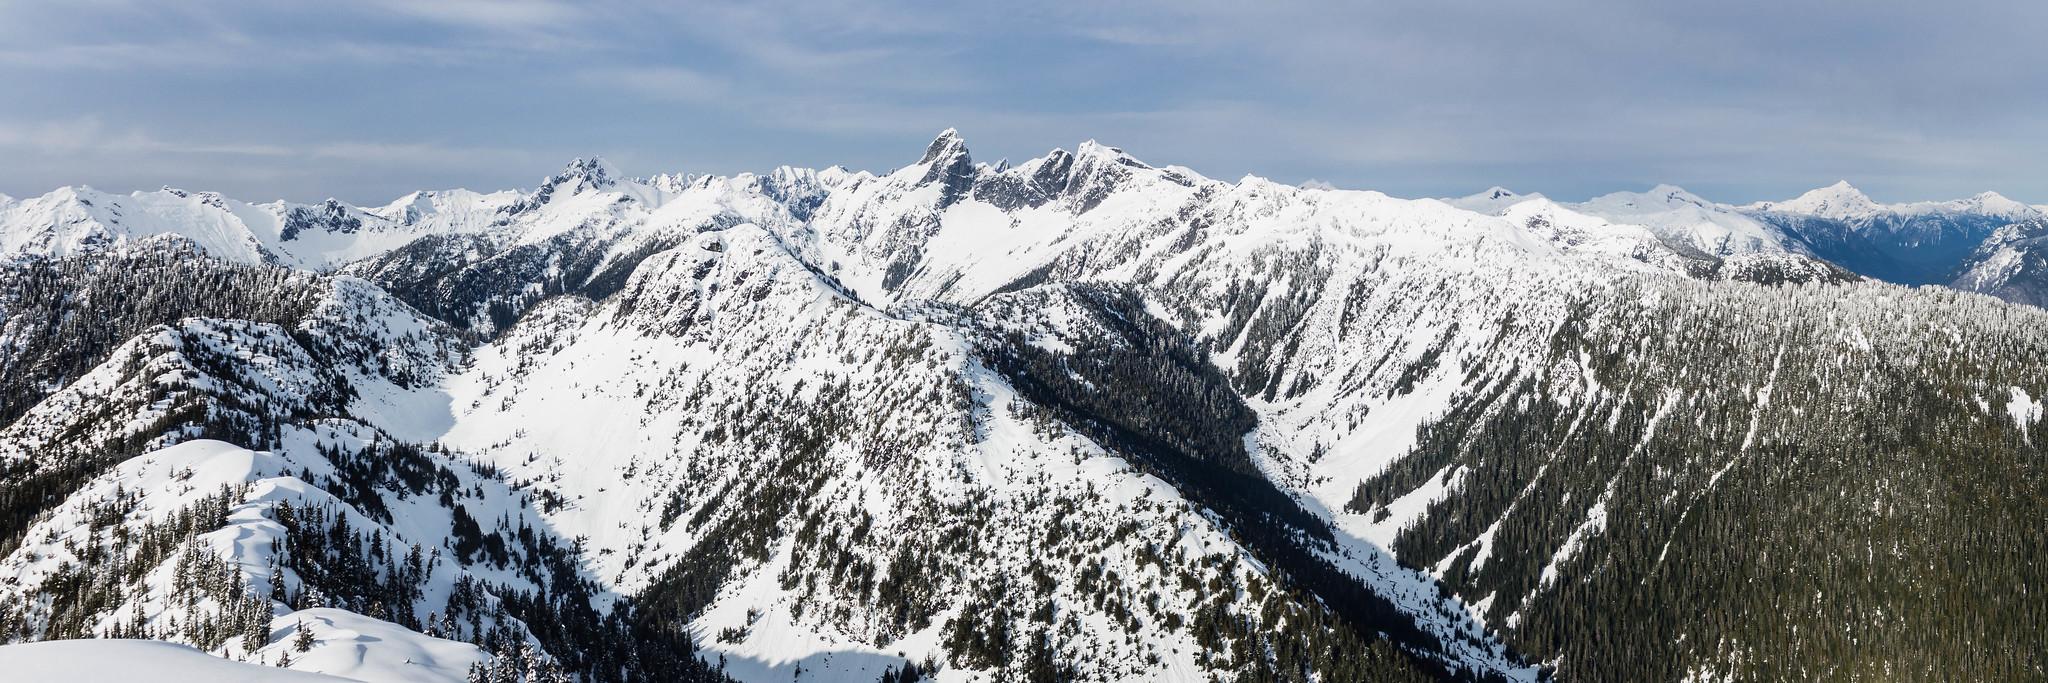 North-to-northeast panoramic view